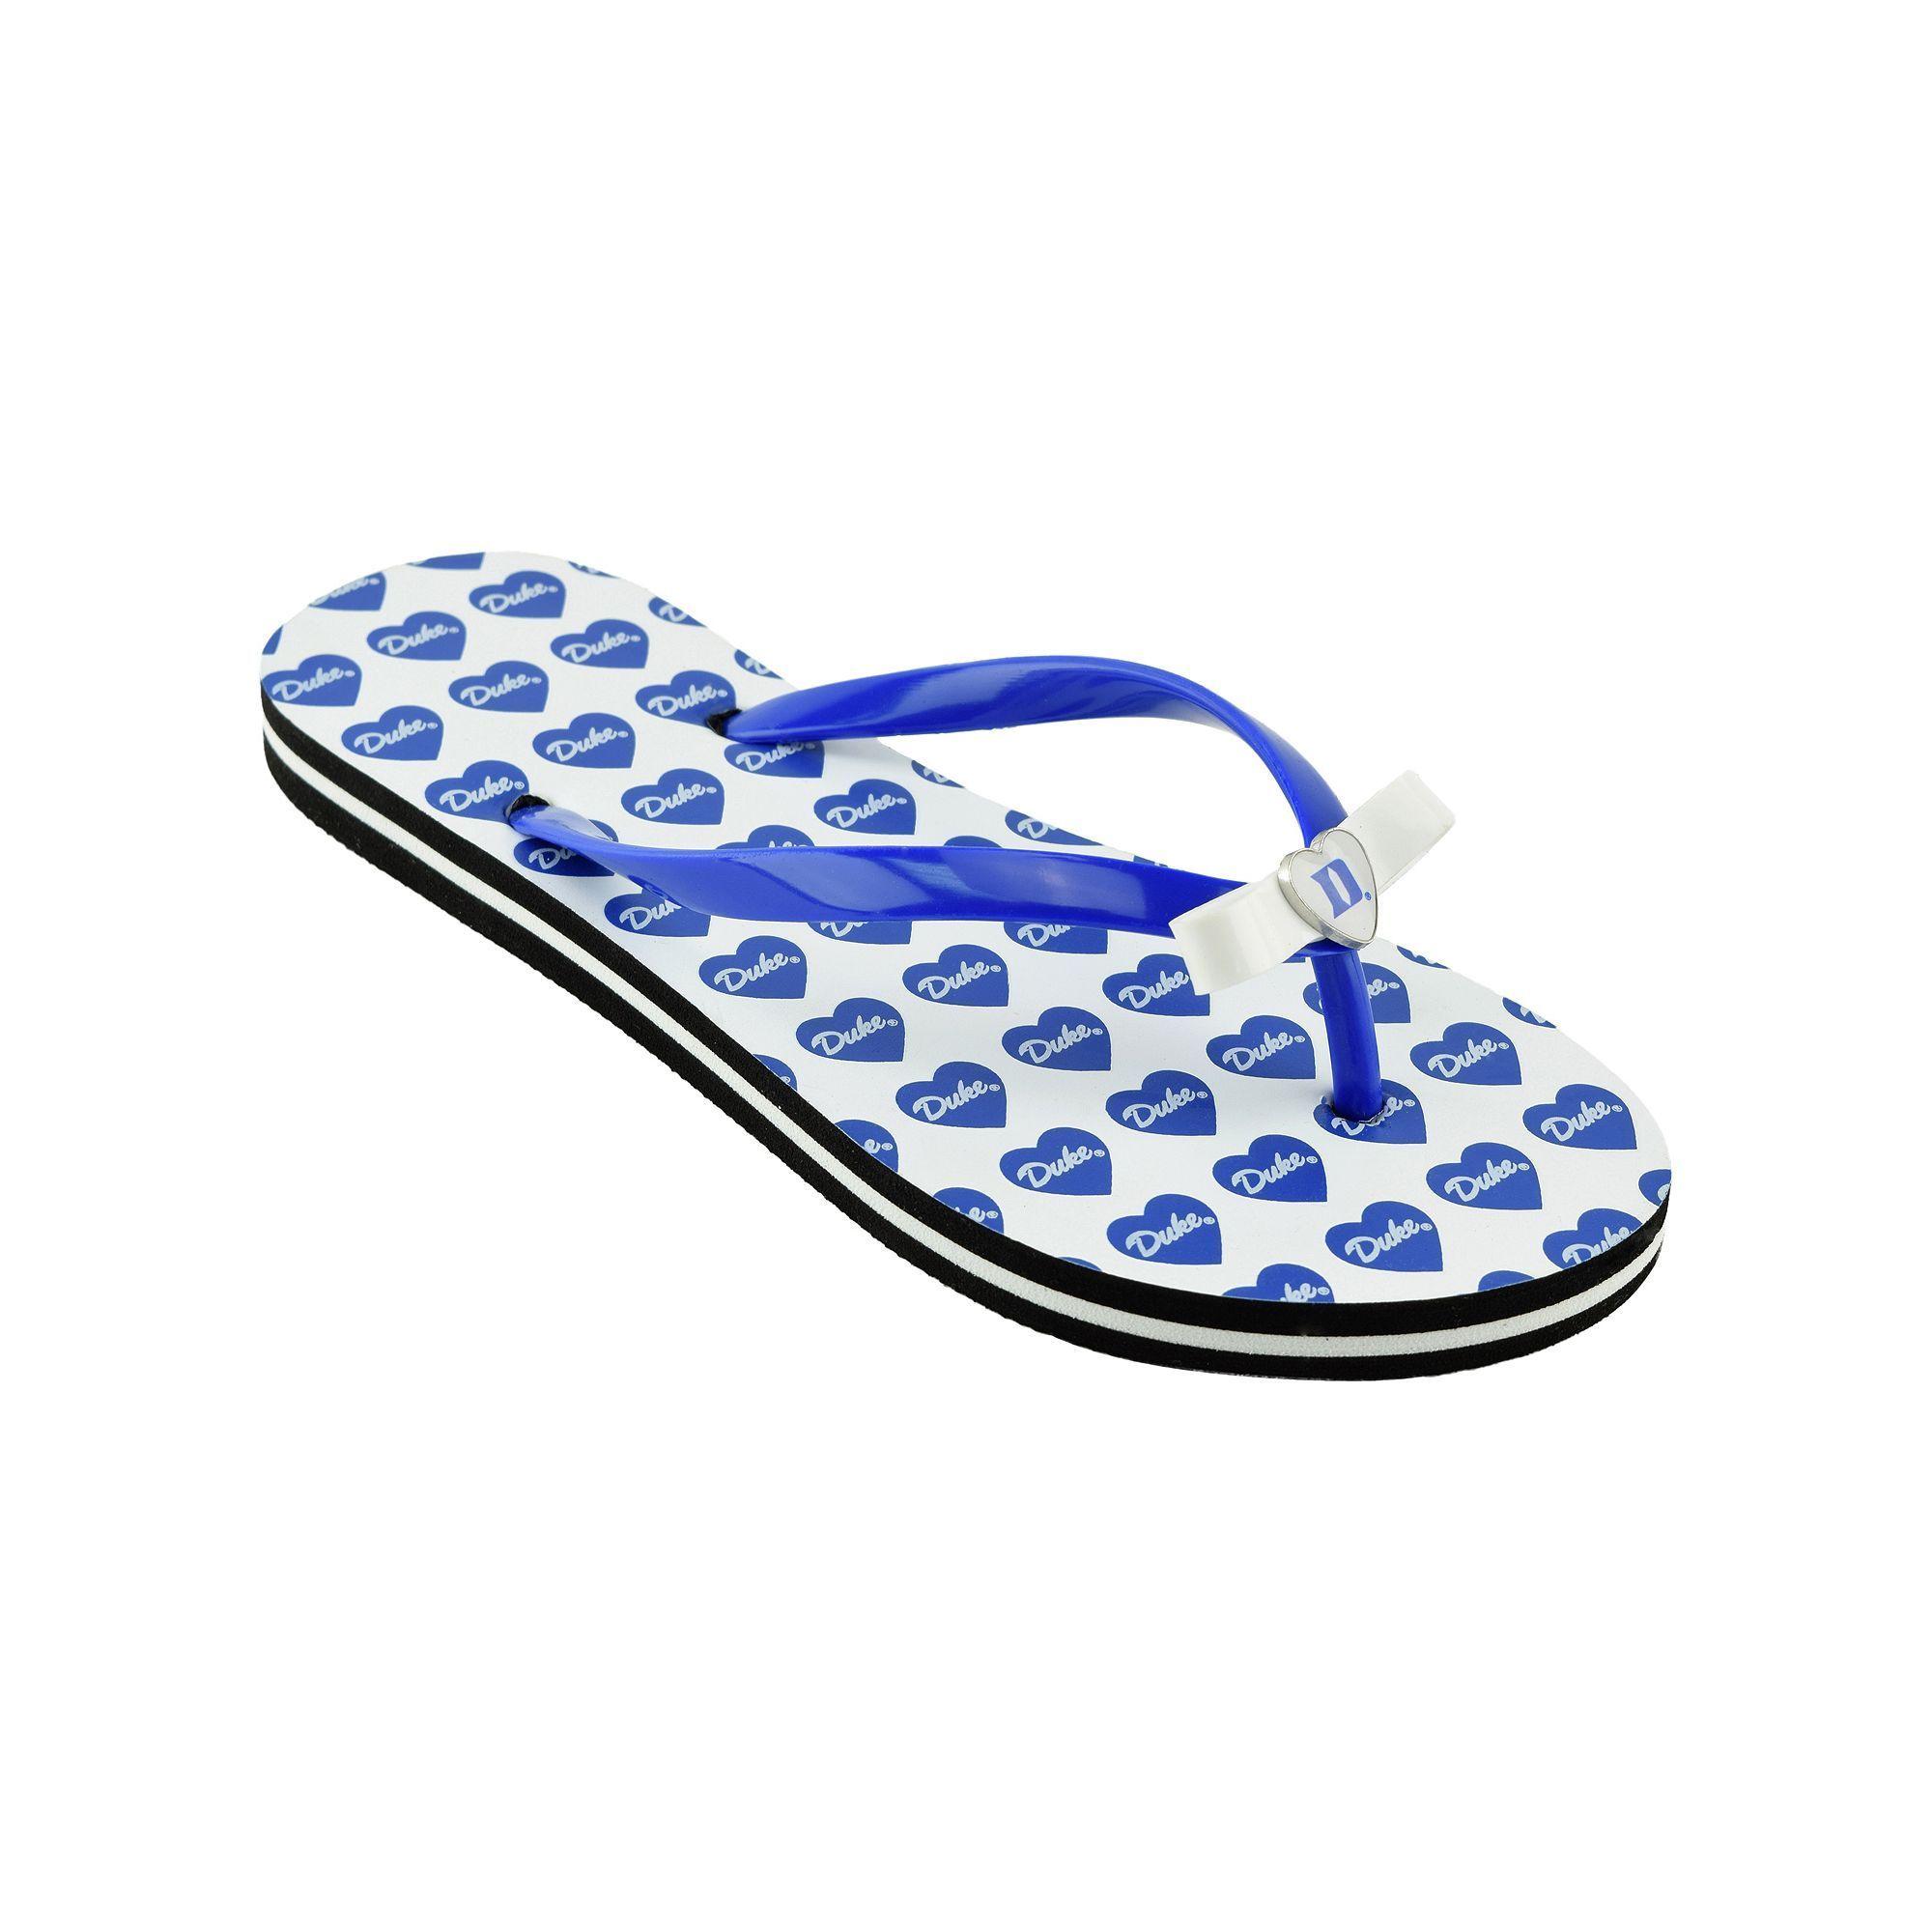 big discount online Women's Duke Blue Devils Flip ... Flops cheap price wholesale price ev8joLVKaD